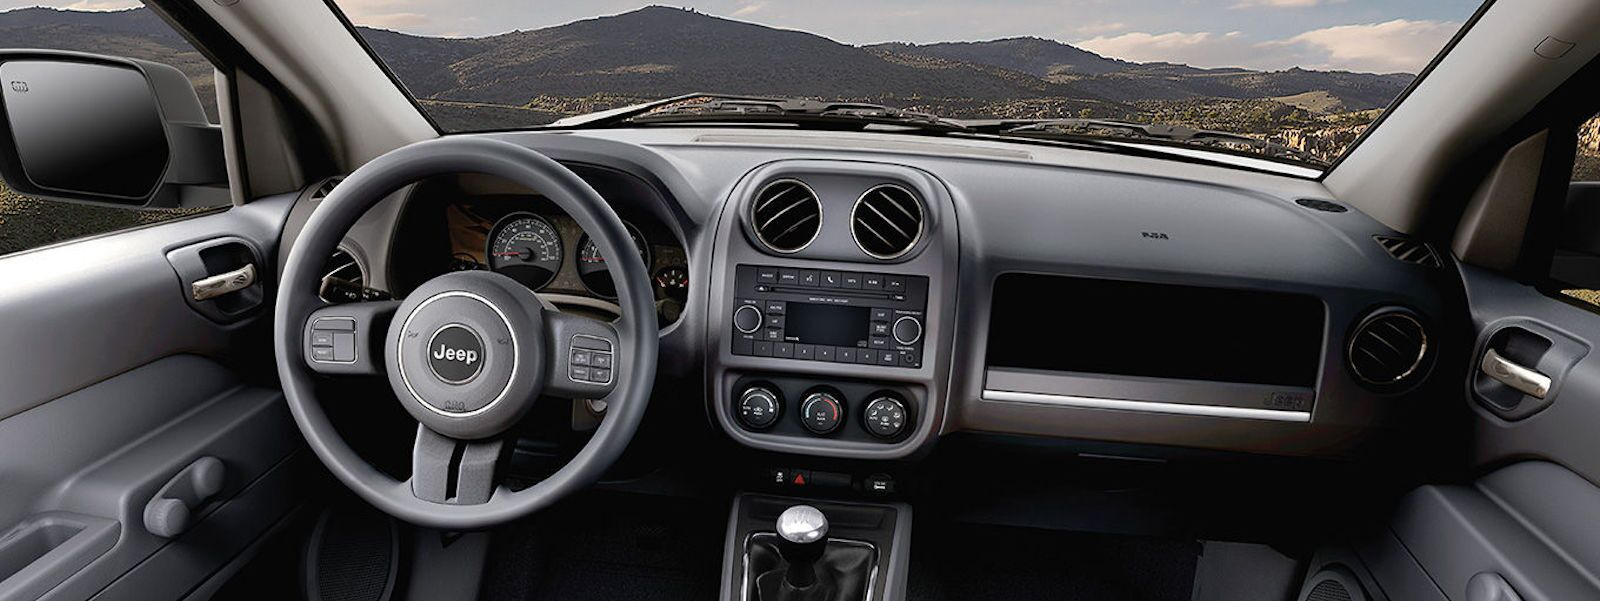 2016 Jeep Patriot Technology